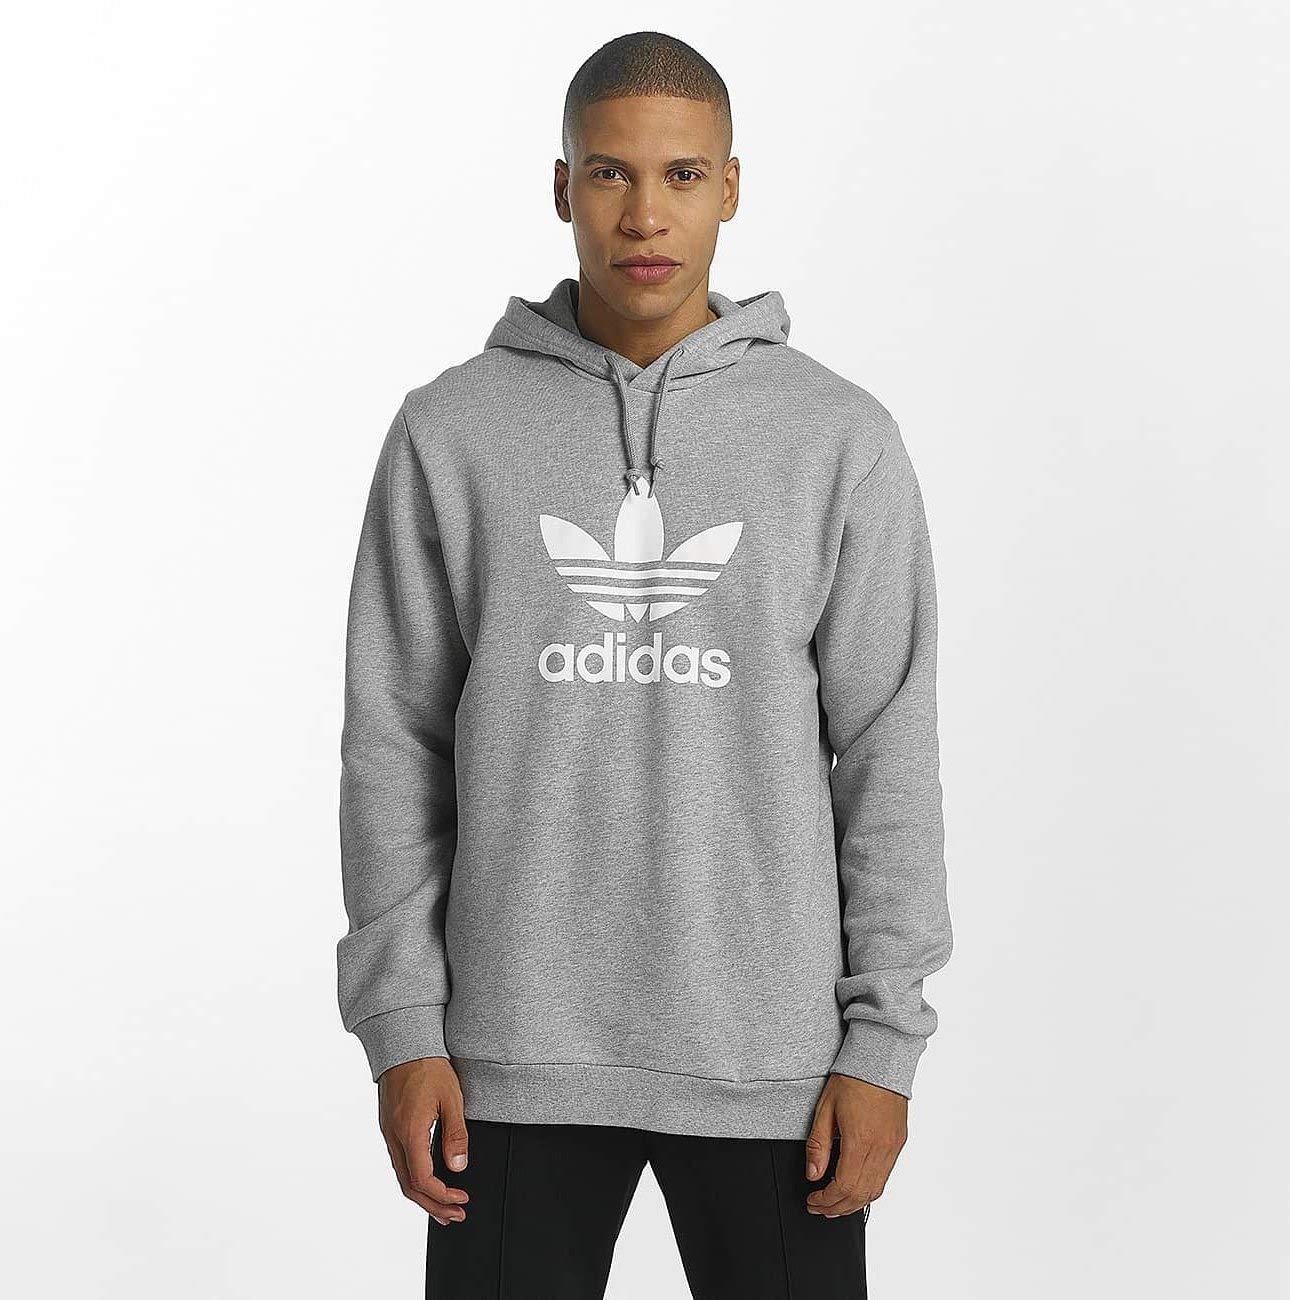 adidas Men's Trefoil Hooded Sweatshirt ADIEY|#adidas